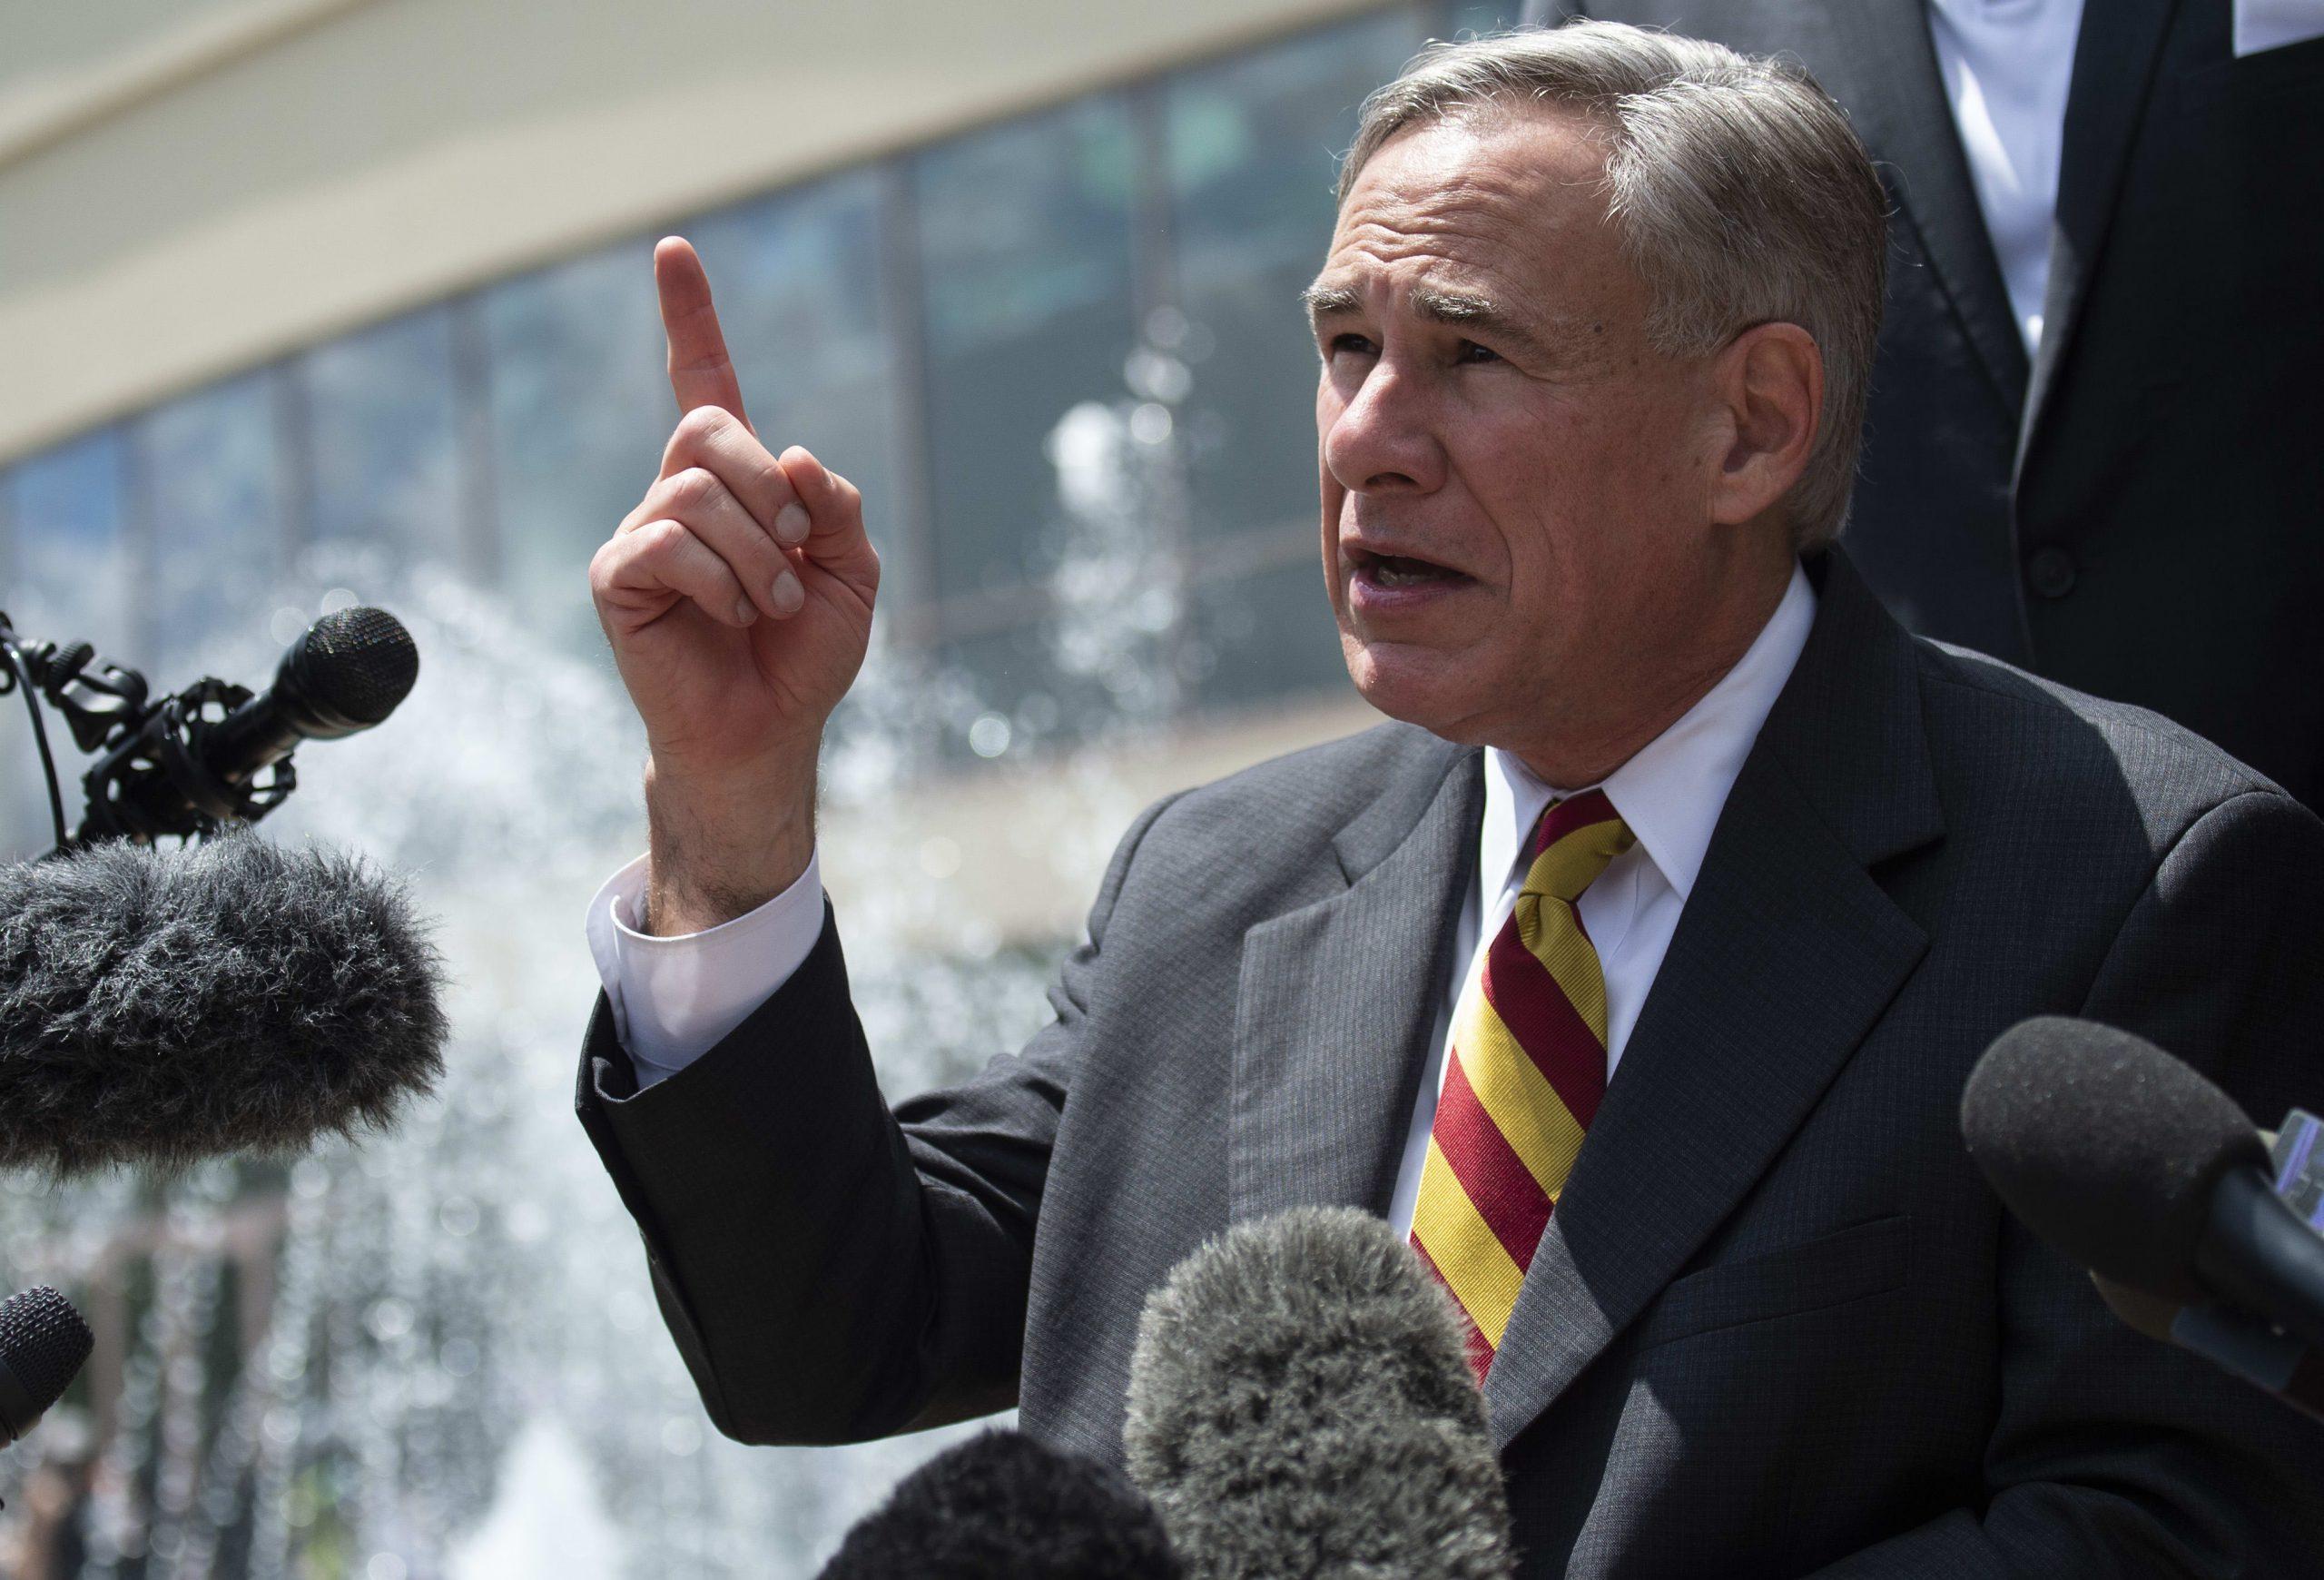 Texas coronavirus outbreak 'going to take a little while' to eliminate, Gov. Abbott says